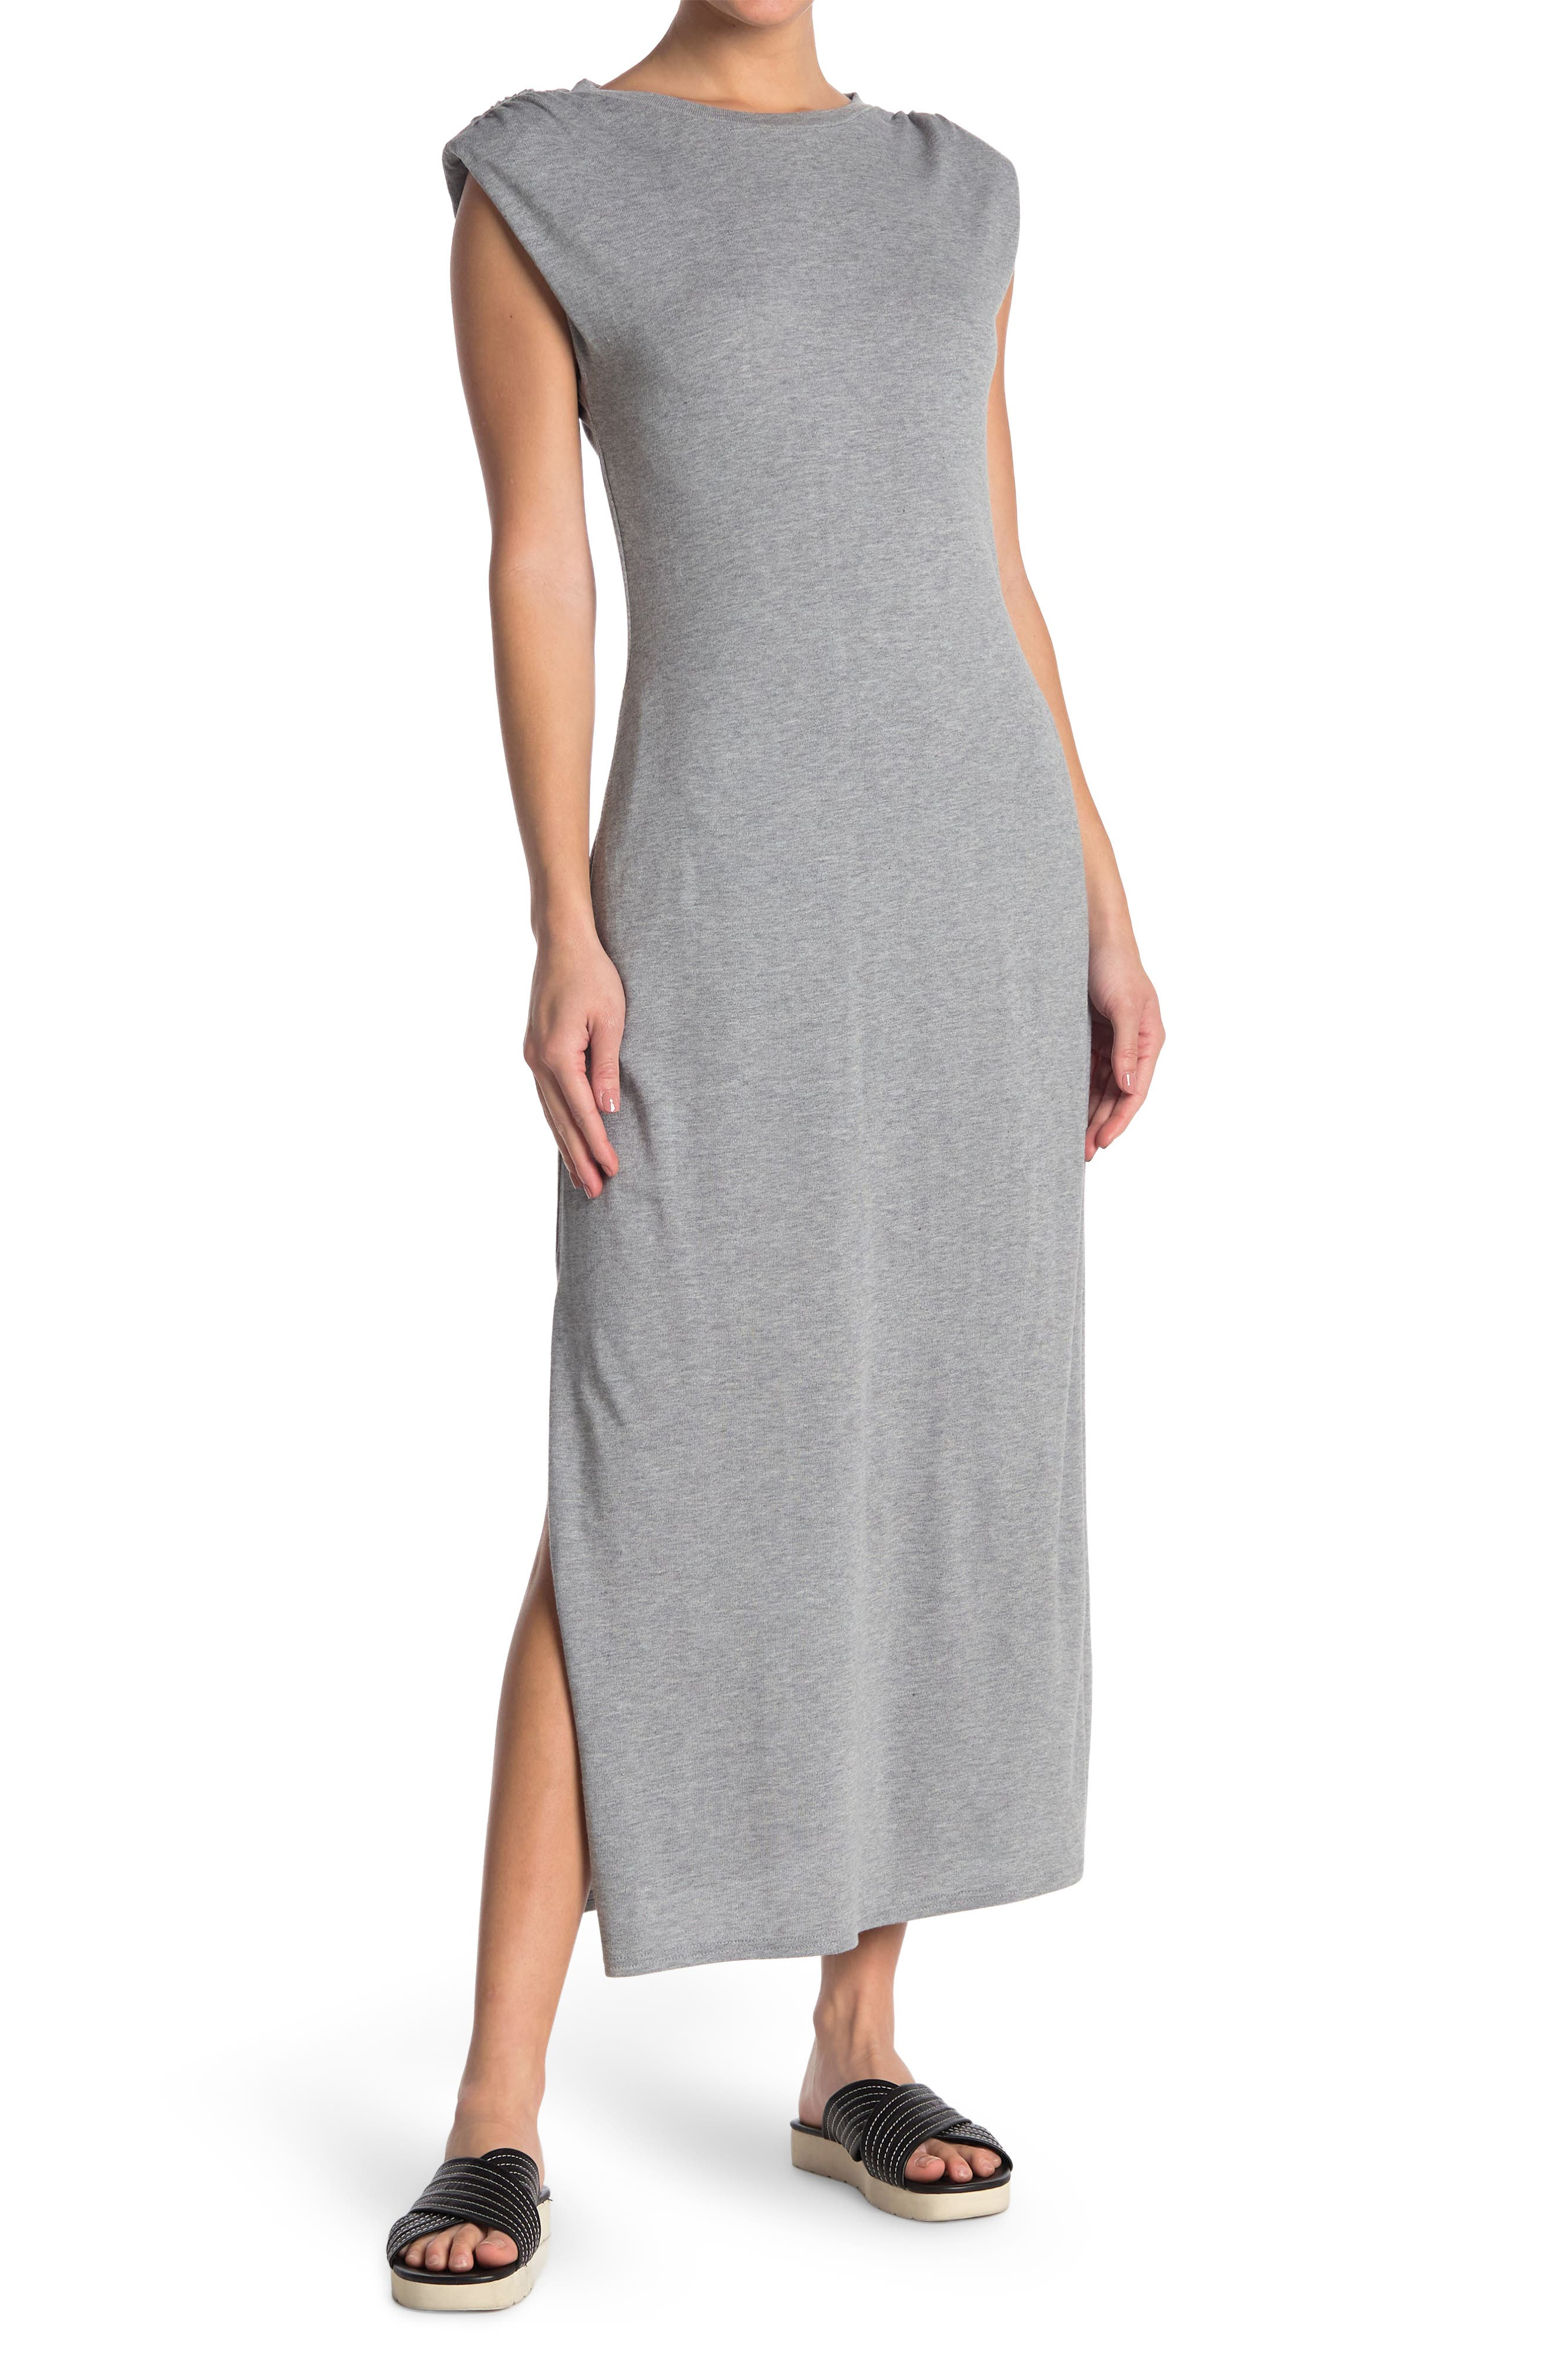 Melloday Padded Shoulder Cozy Midi Dress In Heather Grey